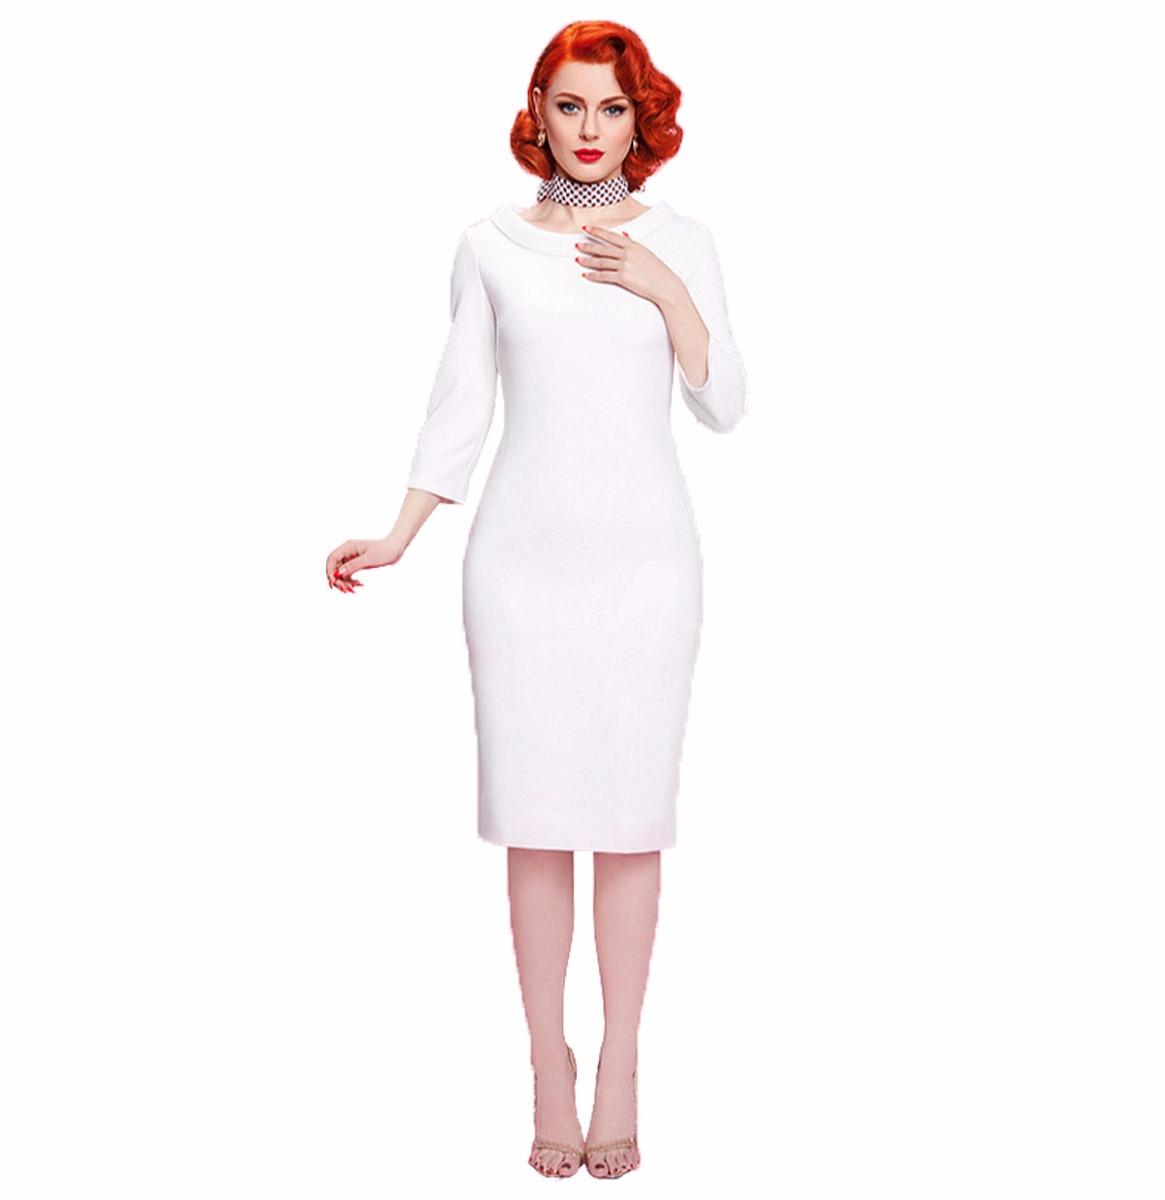 Escapade Dress White